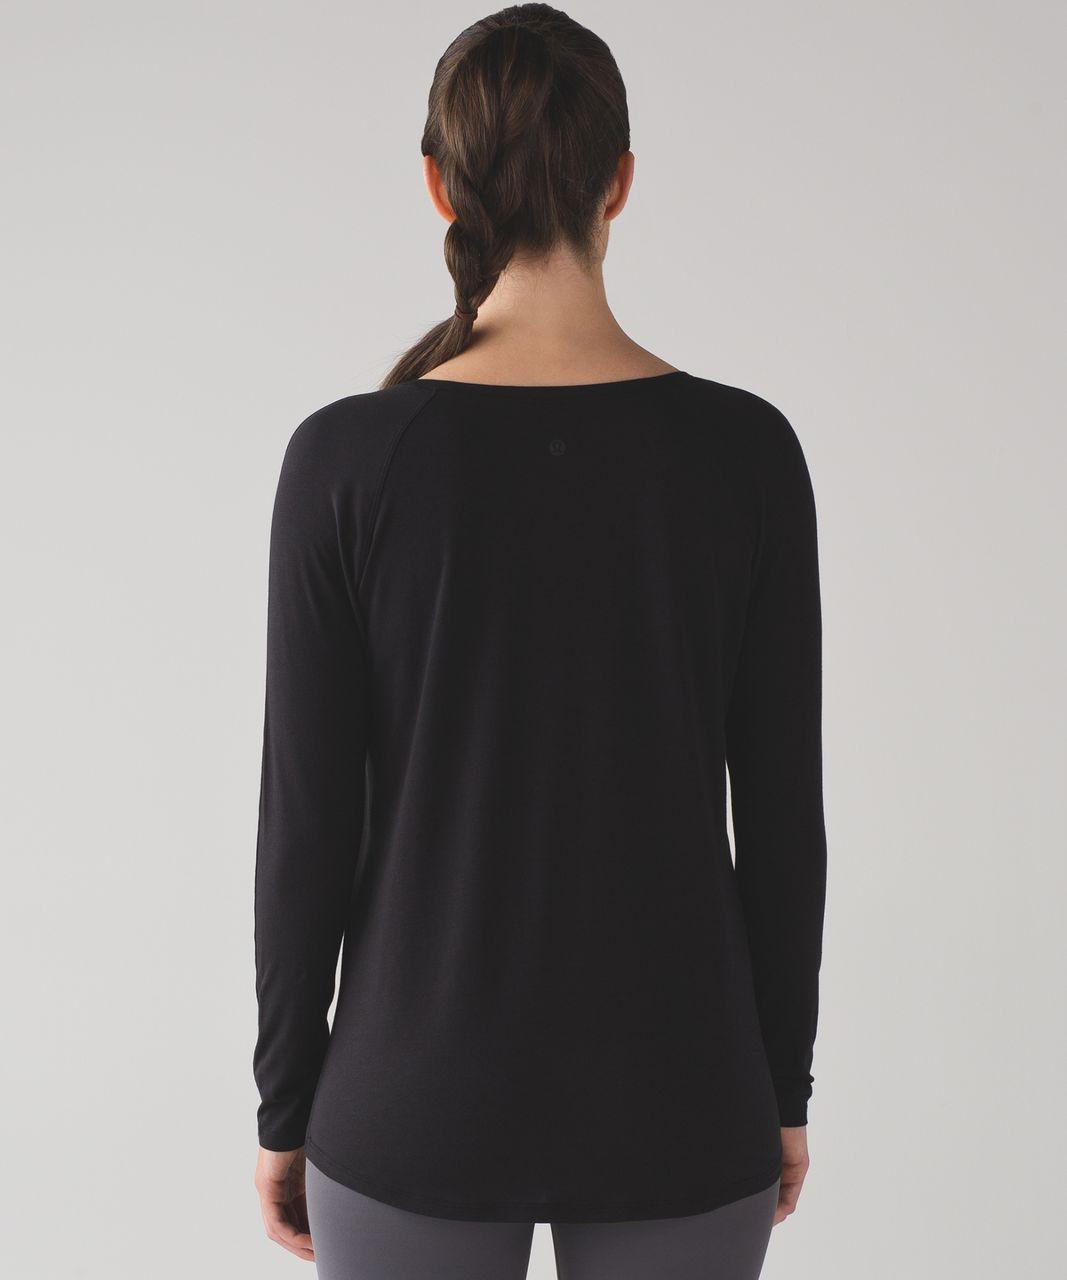 Lululemon Emerald Long Sleeve - Black (First Release)